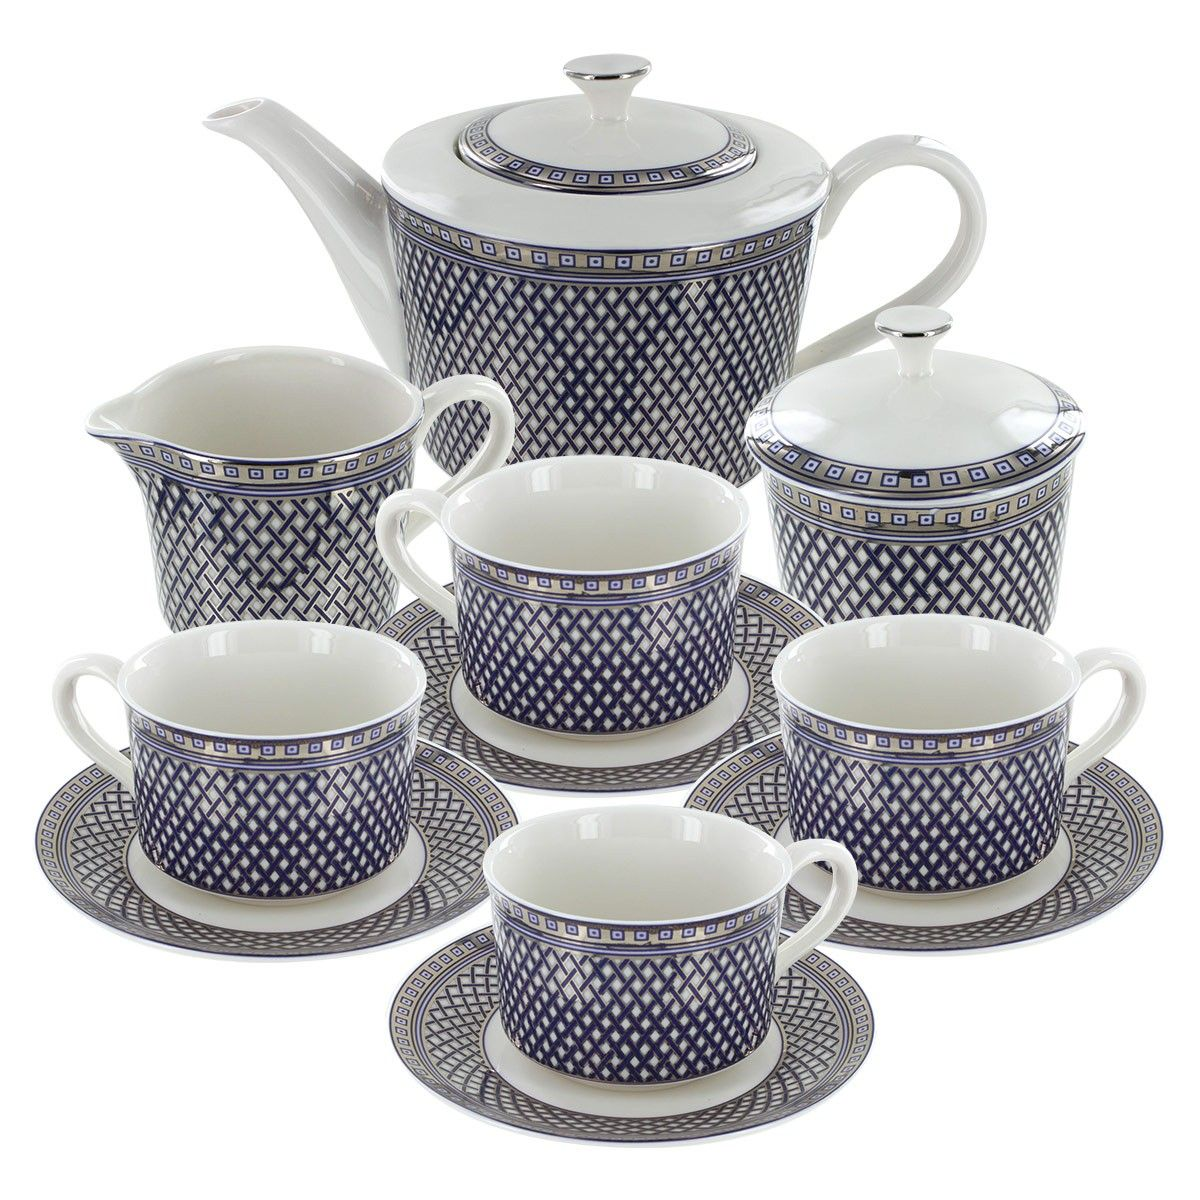 Metro Blue Porcelain Tea Set   Tea set obsessions   Pinterest ...